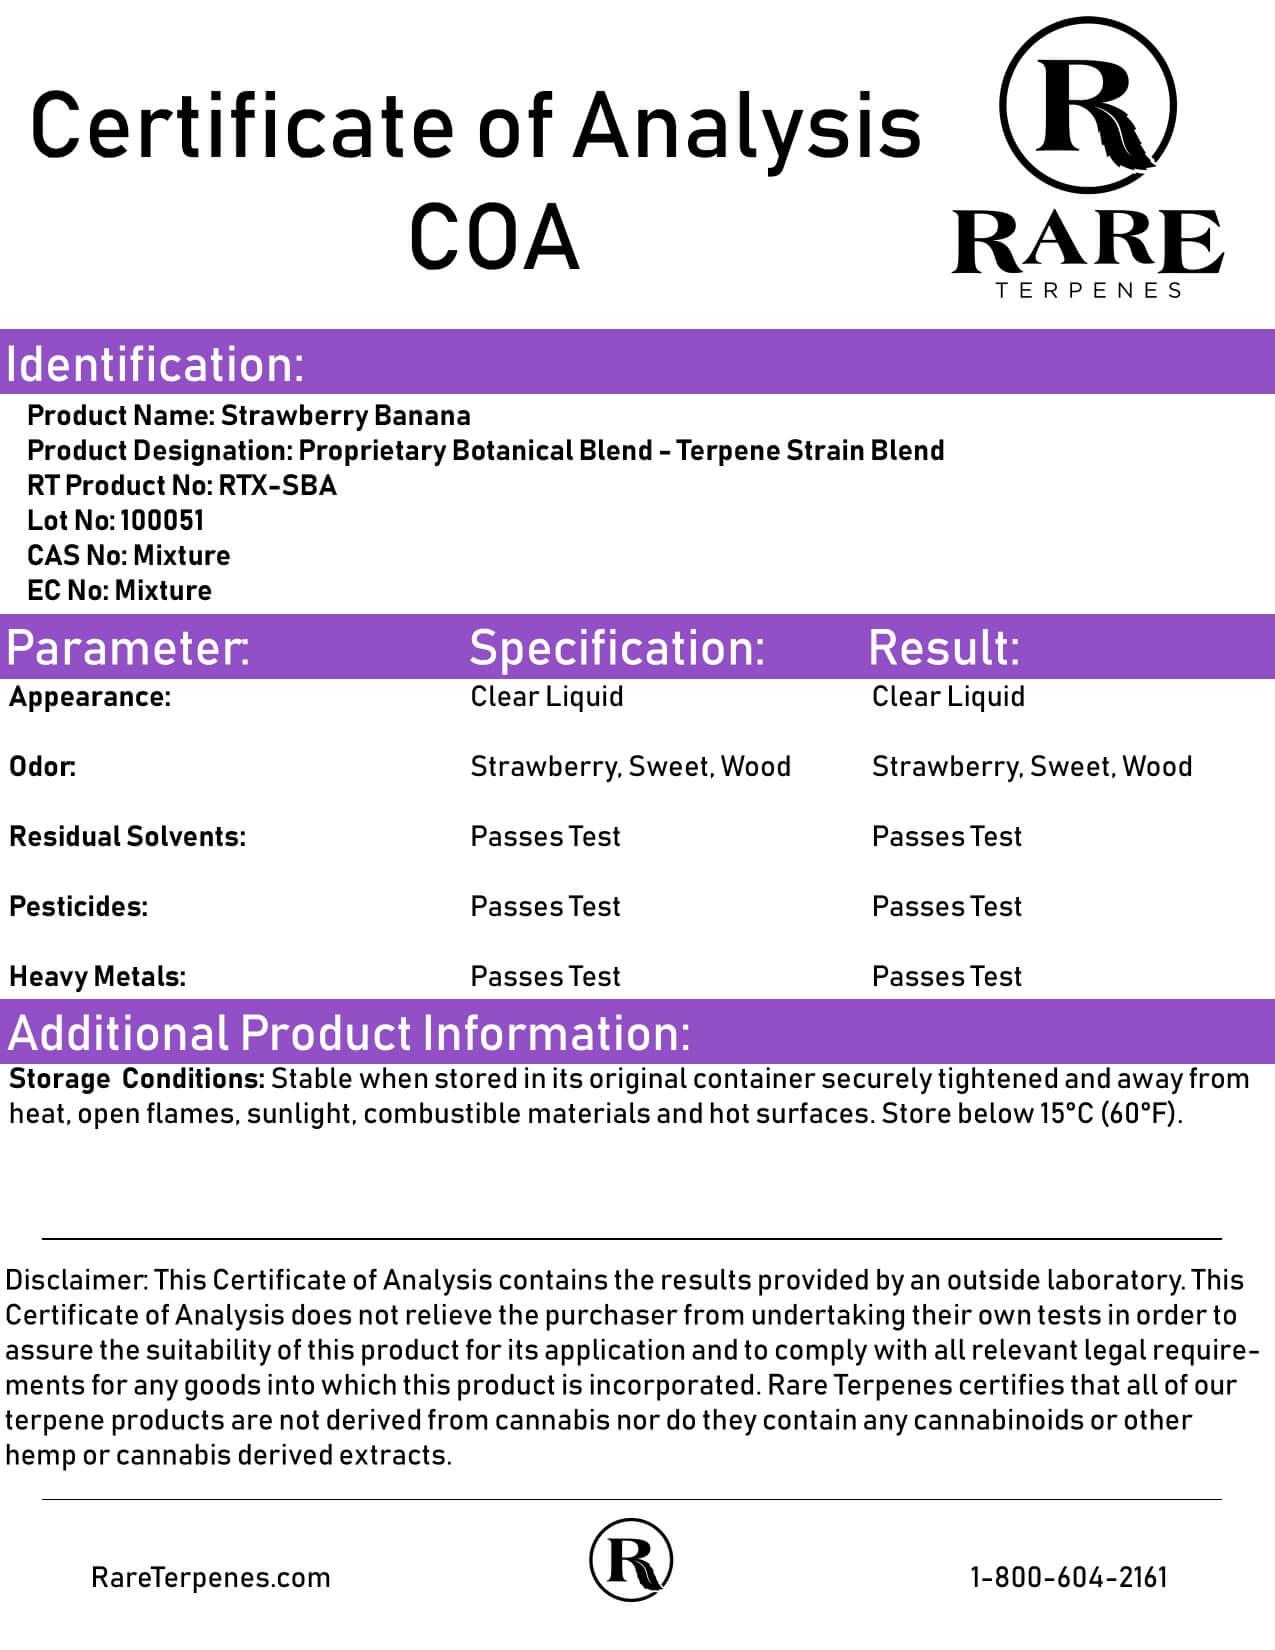 Rare Terpenes Tepene Strain Blends Strawberry Banana Lab Report